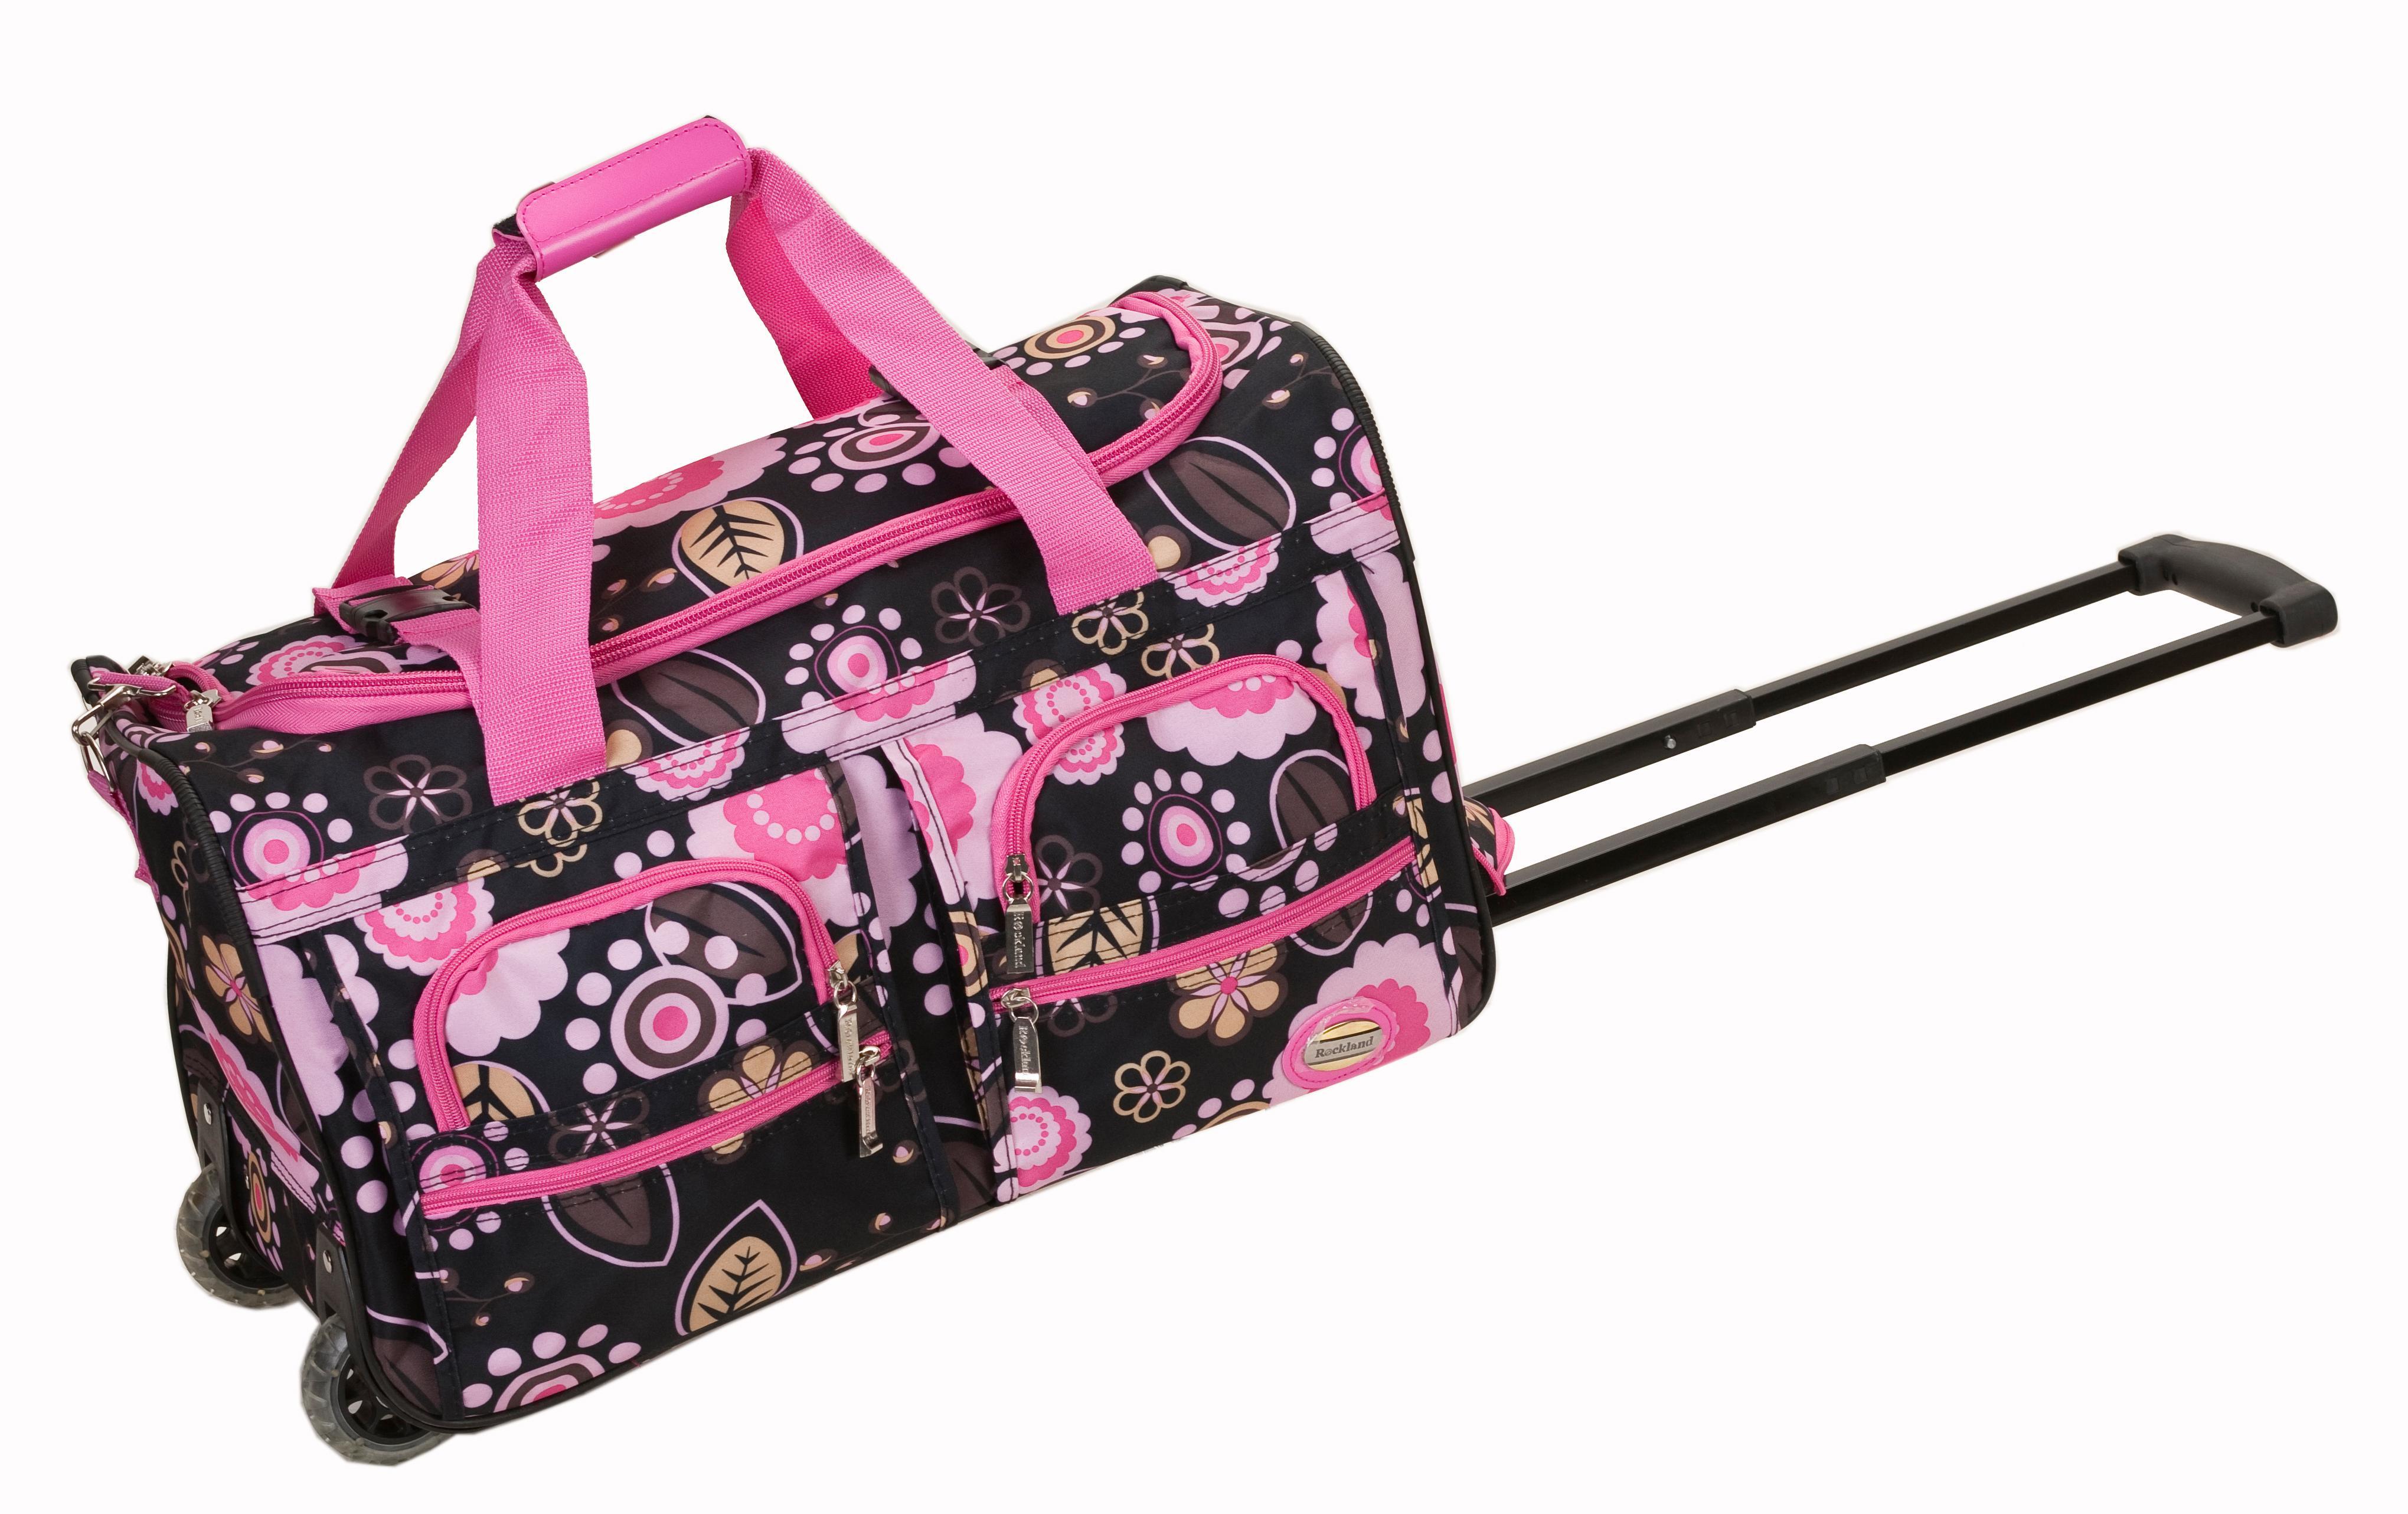 rockland luggage rolling 22 inch duffle bag black